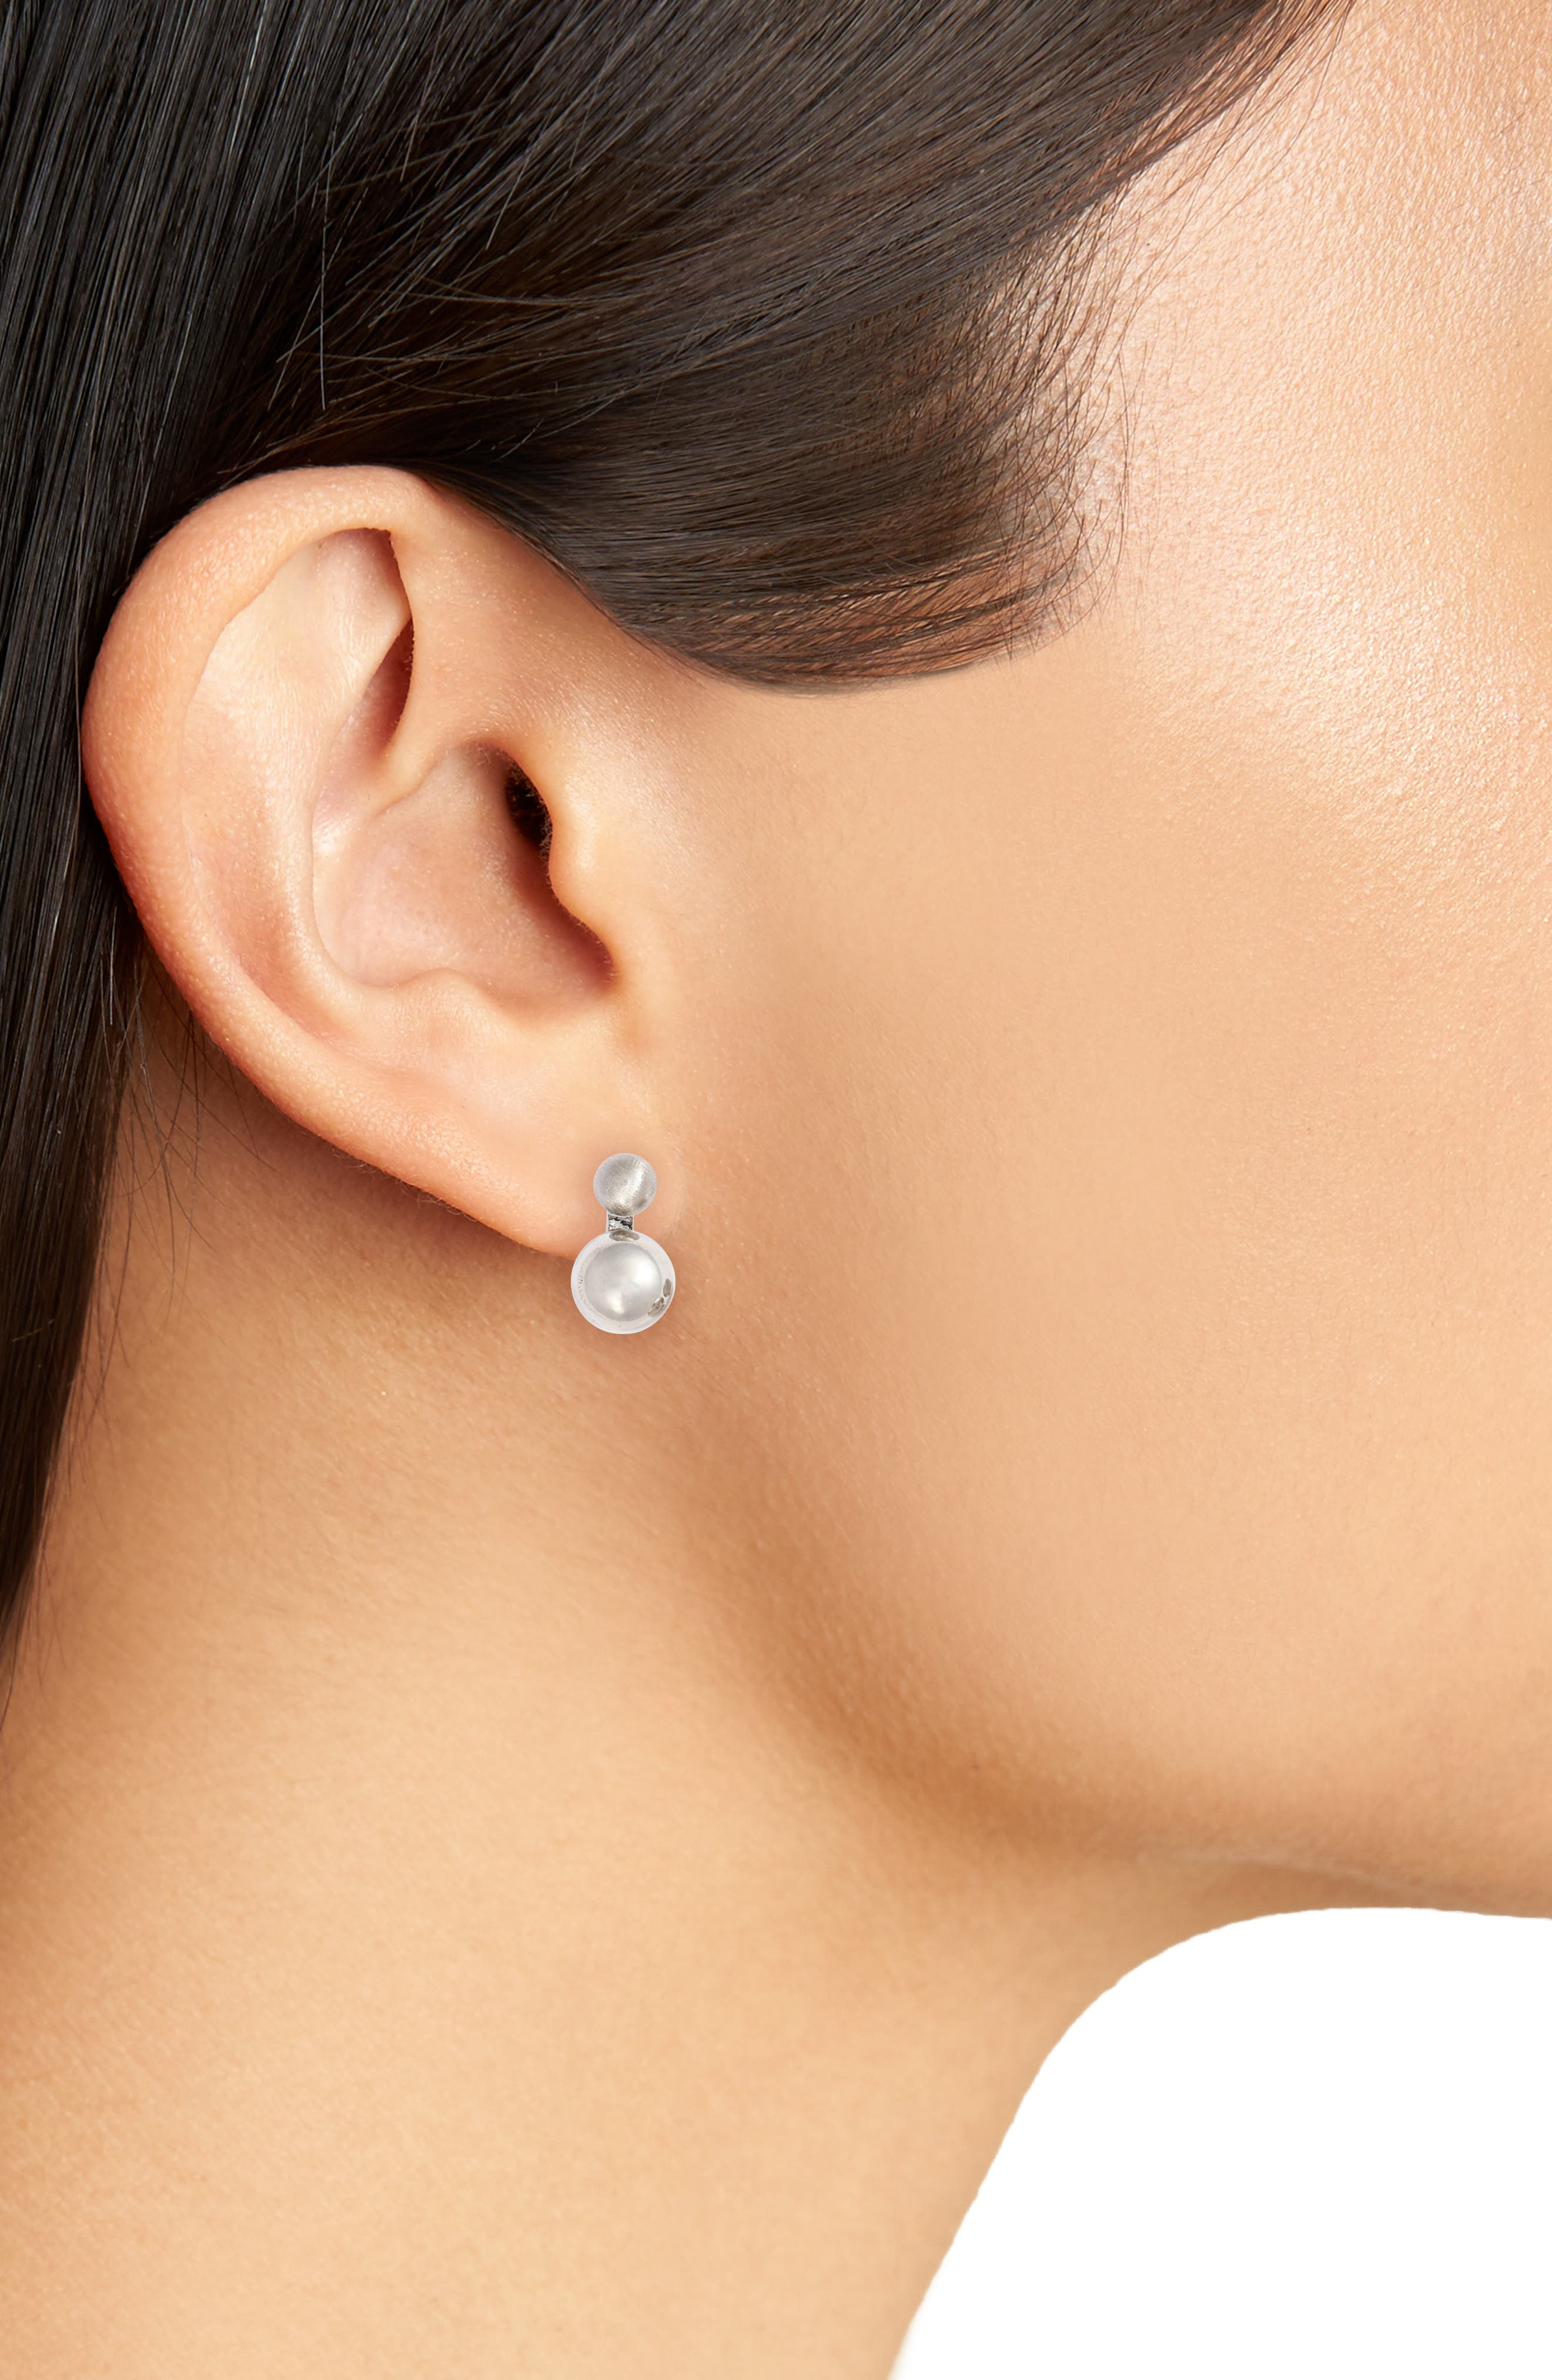 Double Sphere Stud Earrings,                             Alternate thumbnail 2, color,                             040